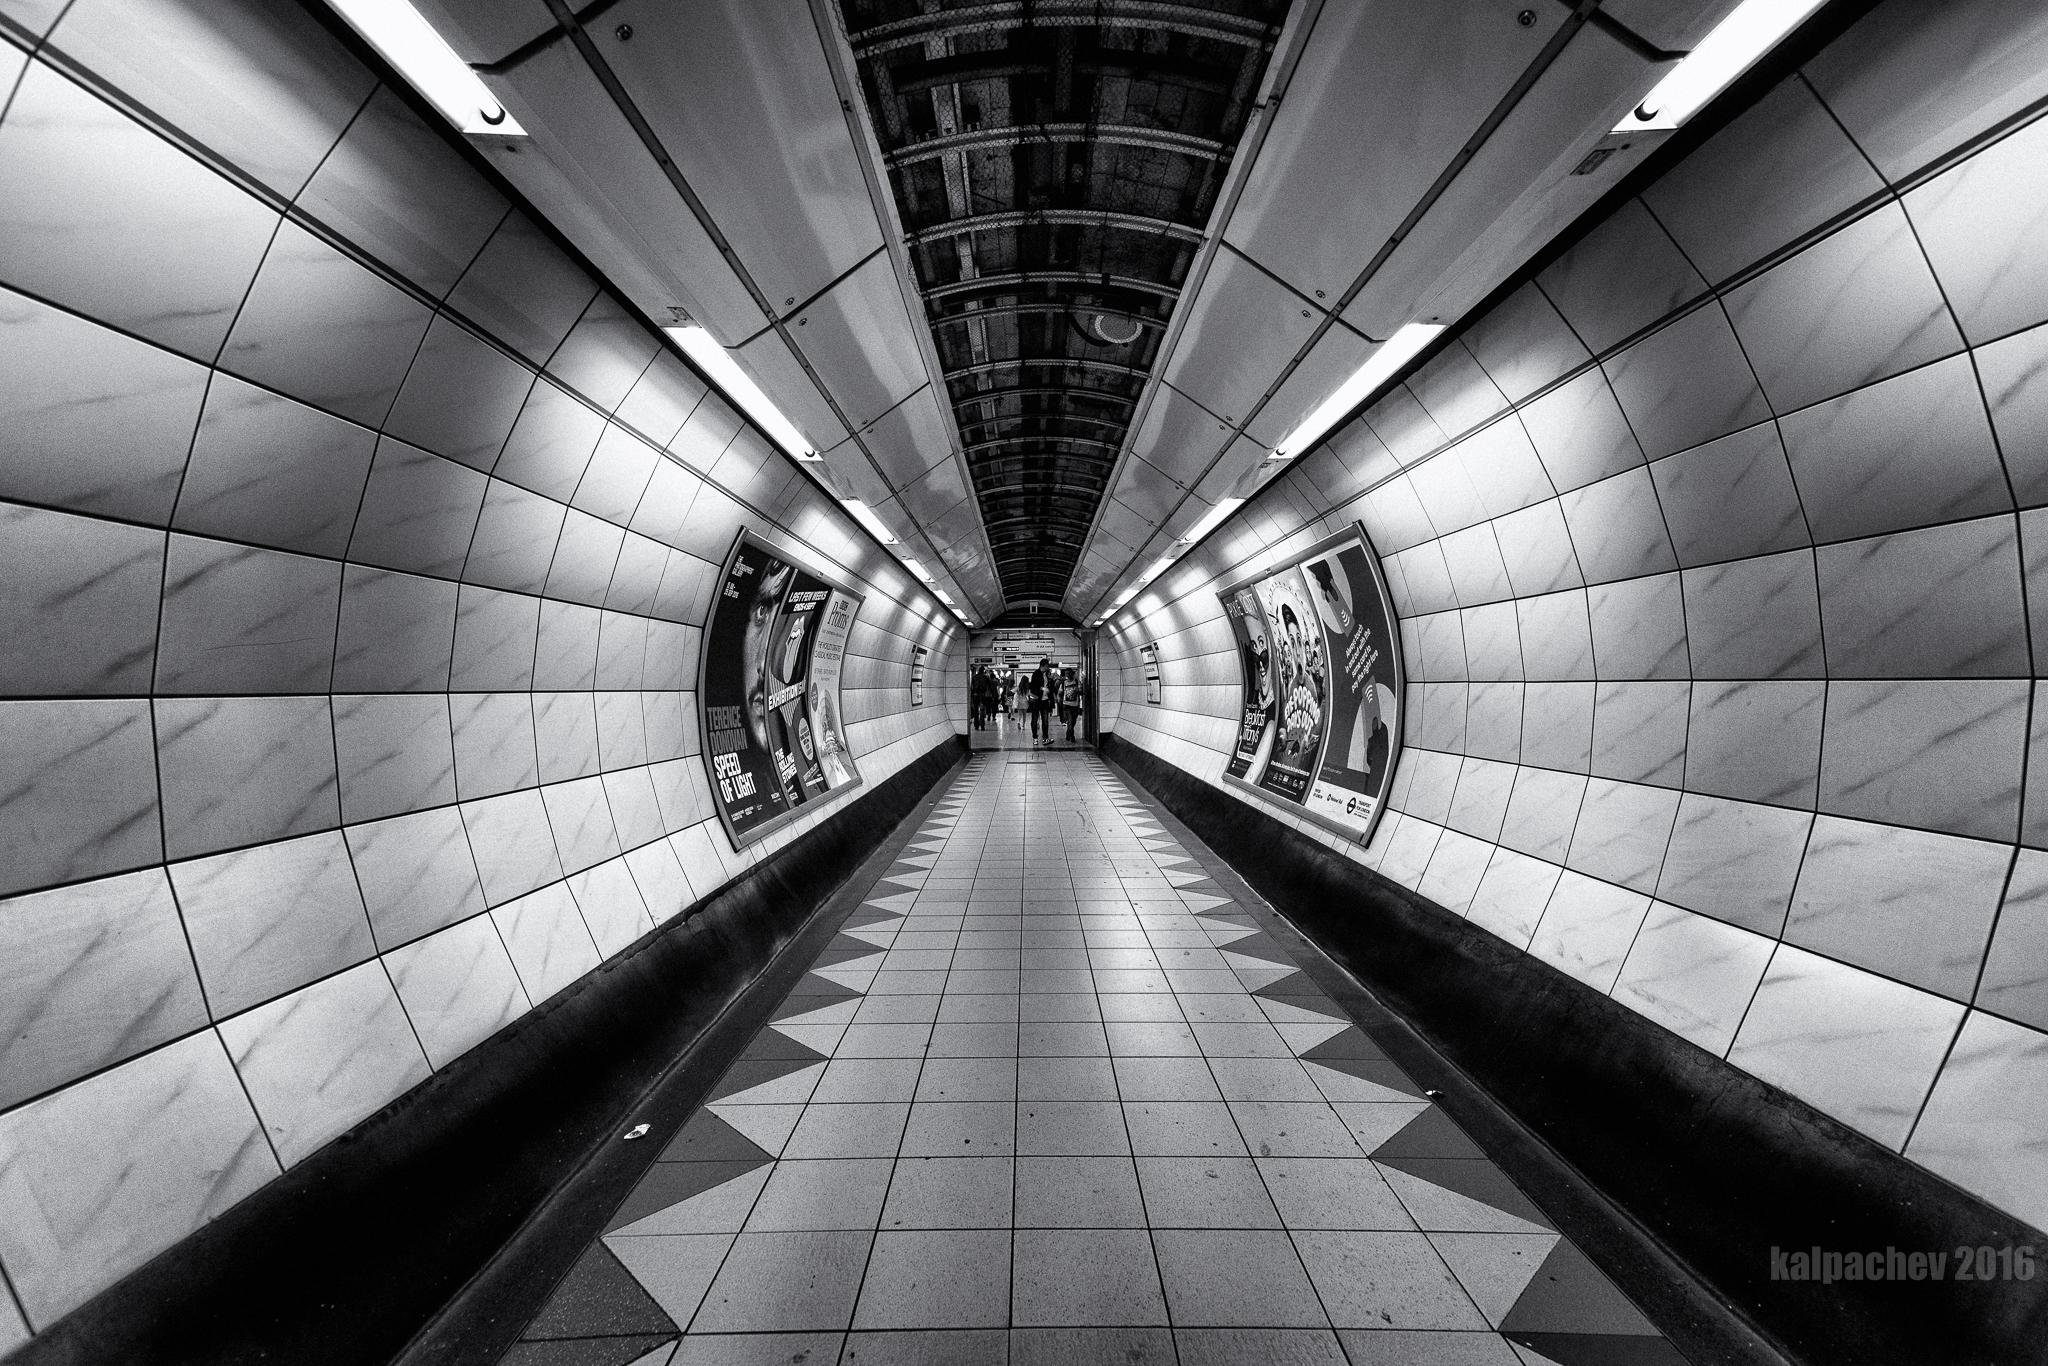 Bank Underground station London #tfl #undergound #london